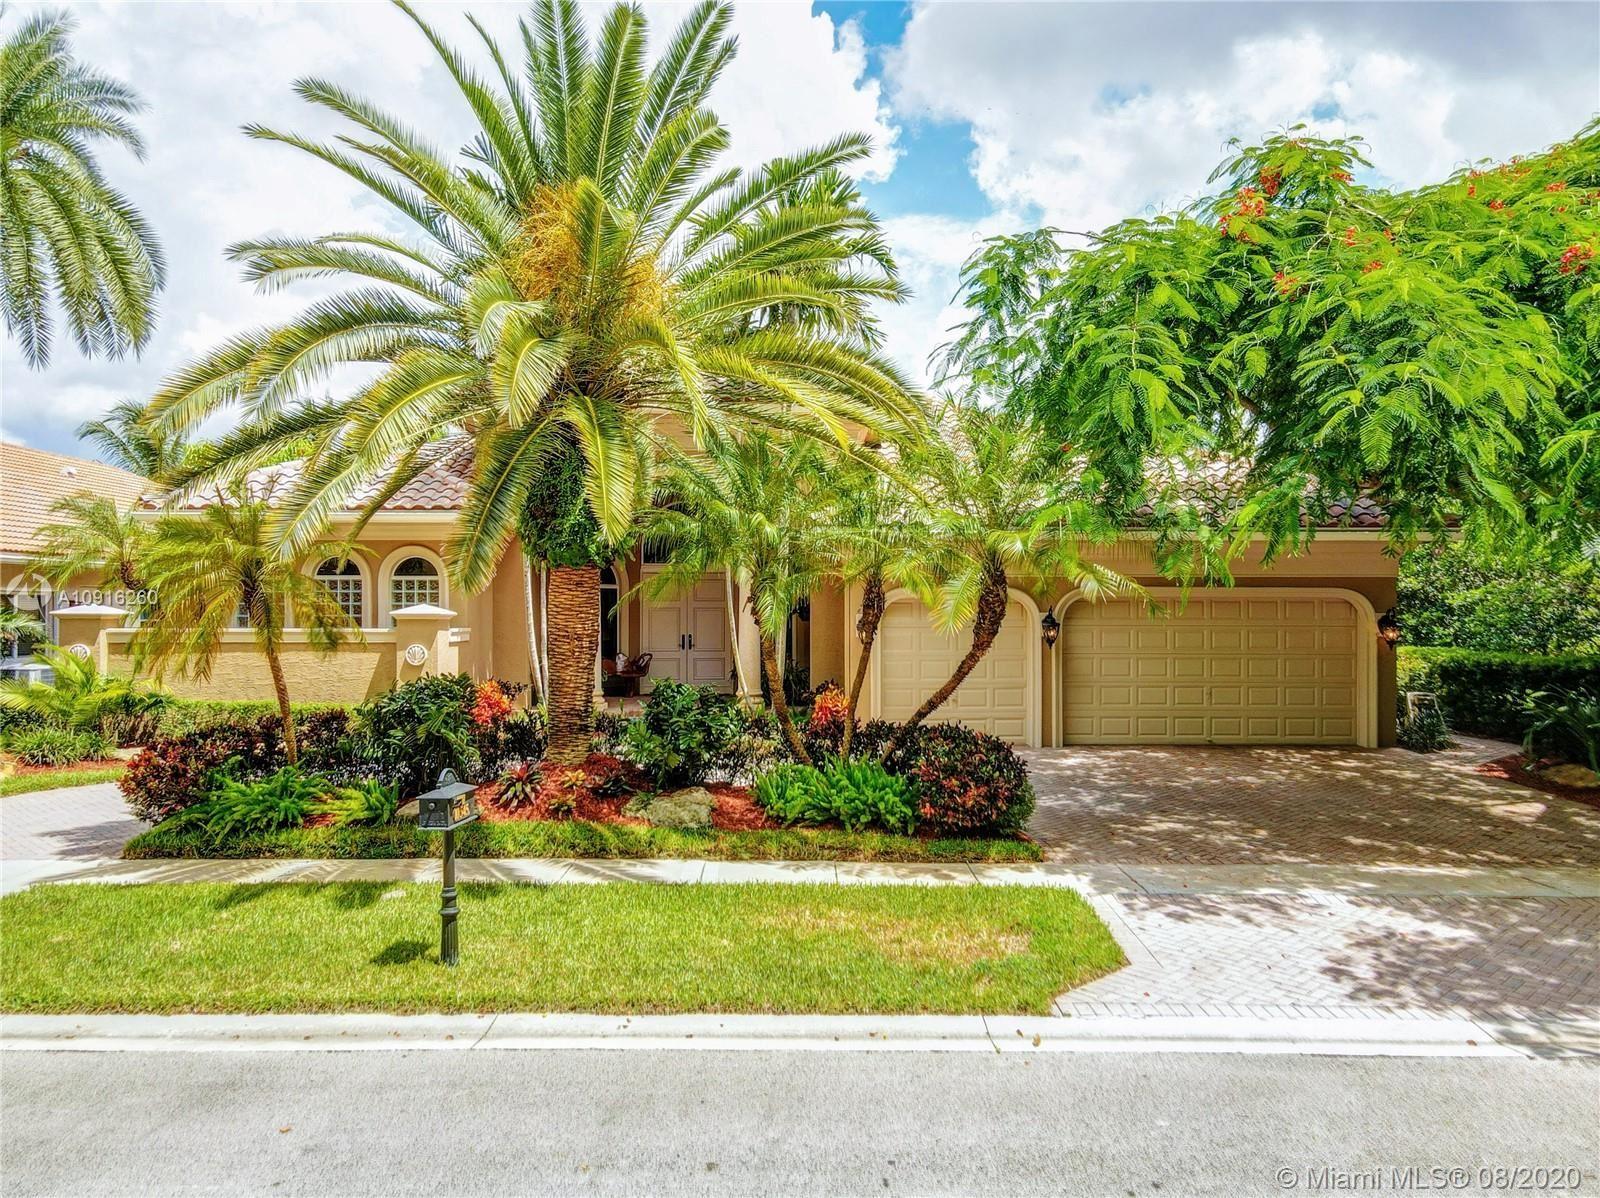 10545 Blue Palm St, Plantation, FL 33324 - #: A10916260